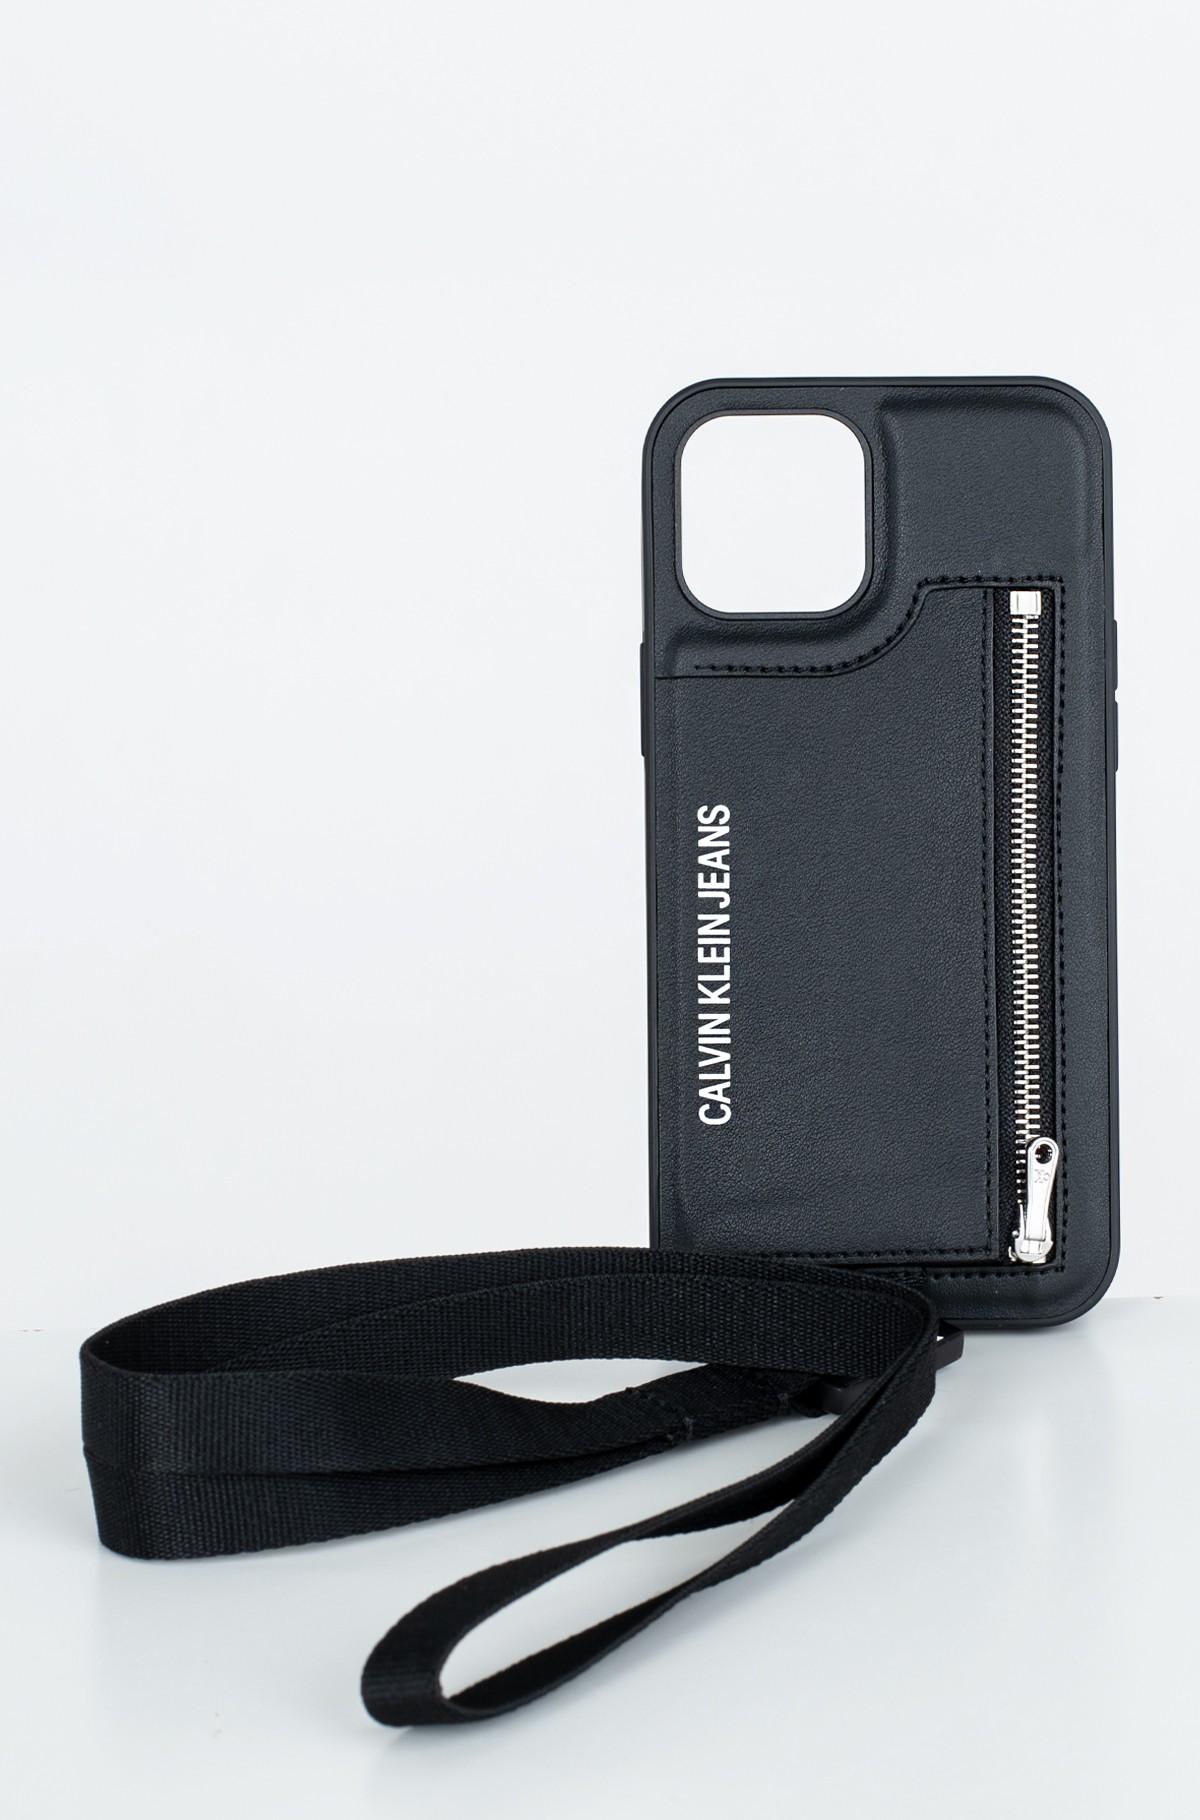 Mobiiltelefoni ümbris PHONE CASE LANYARD W/COIN-full-1